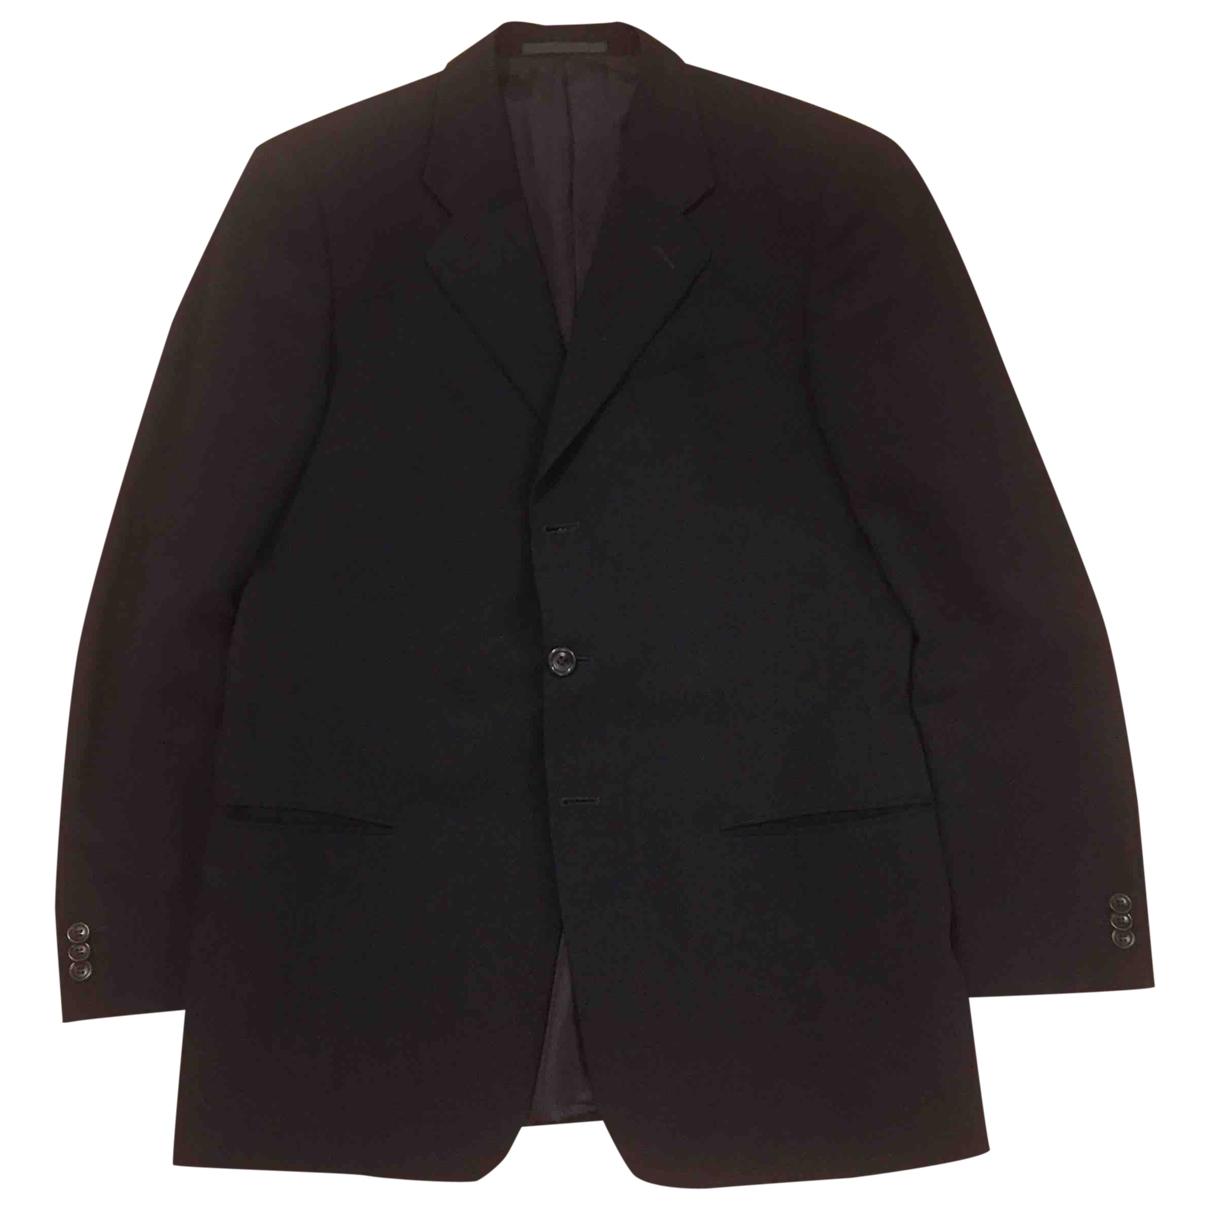 Armani Collezioni \N Black jacket  for Men 50 IT